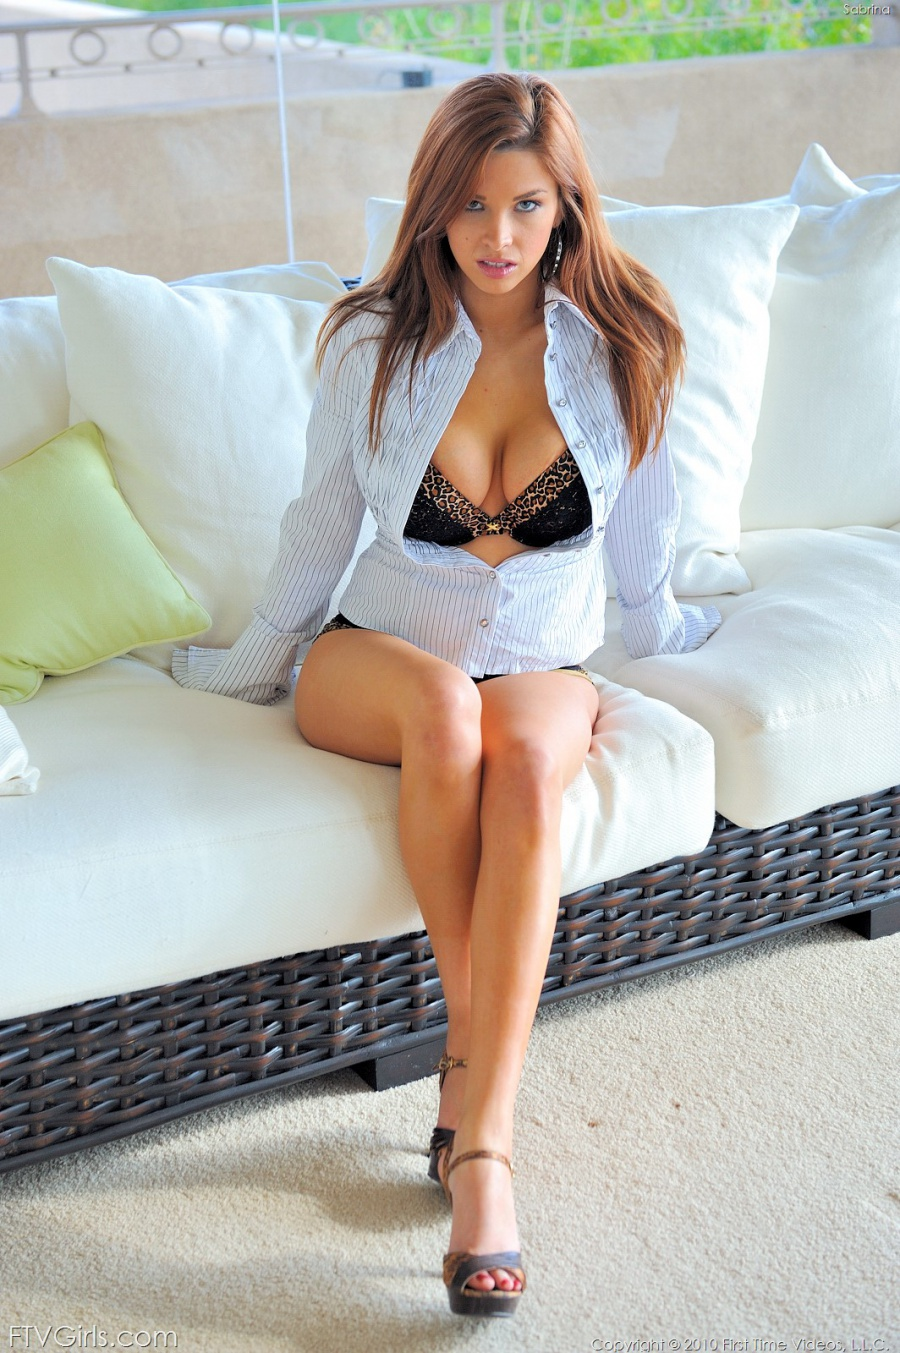 sabrina sexy girl woman